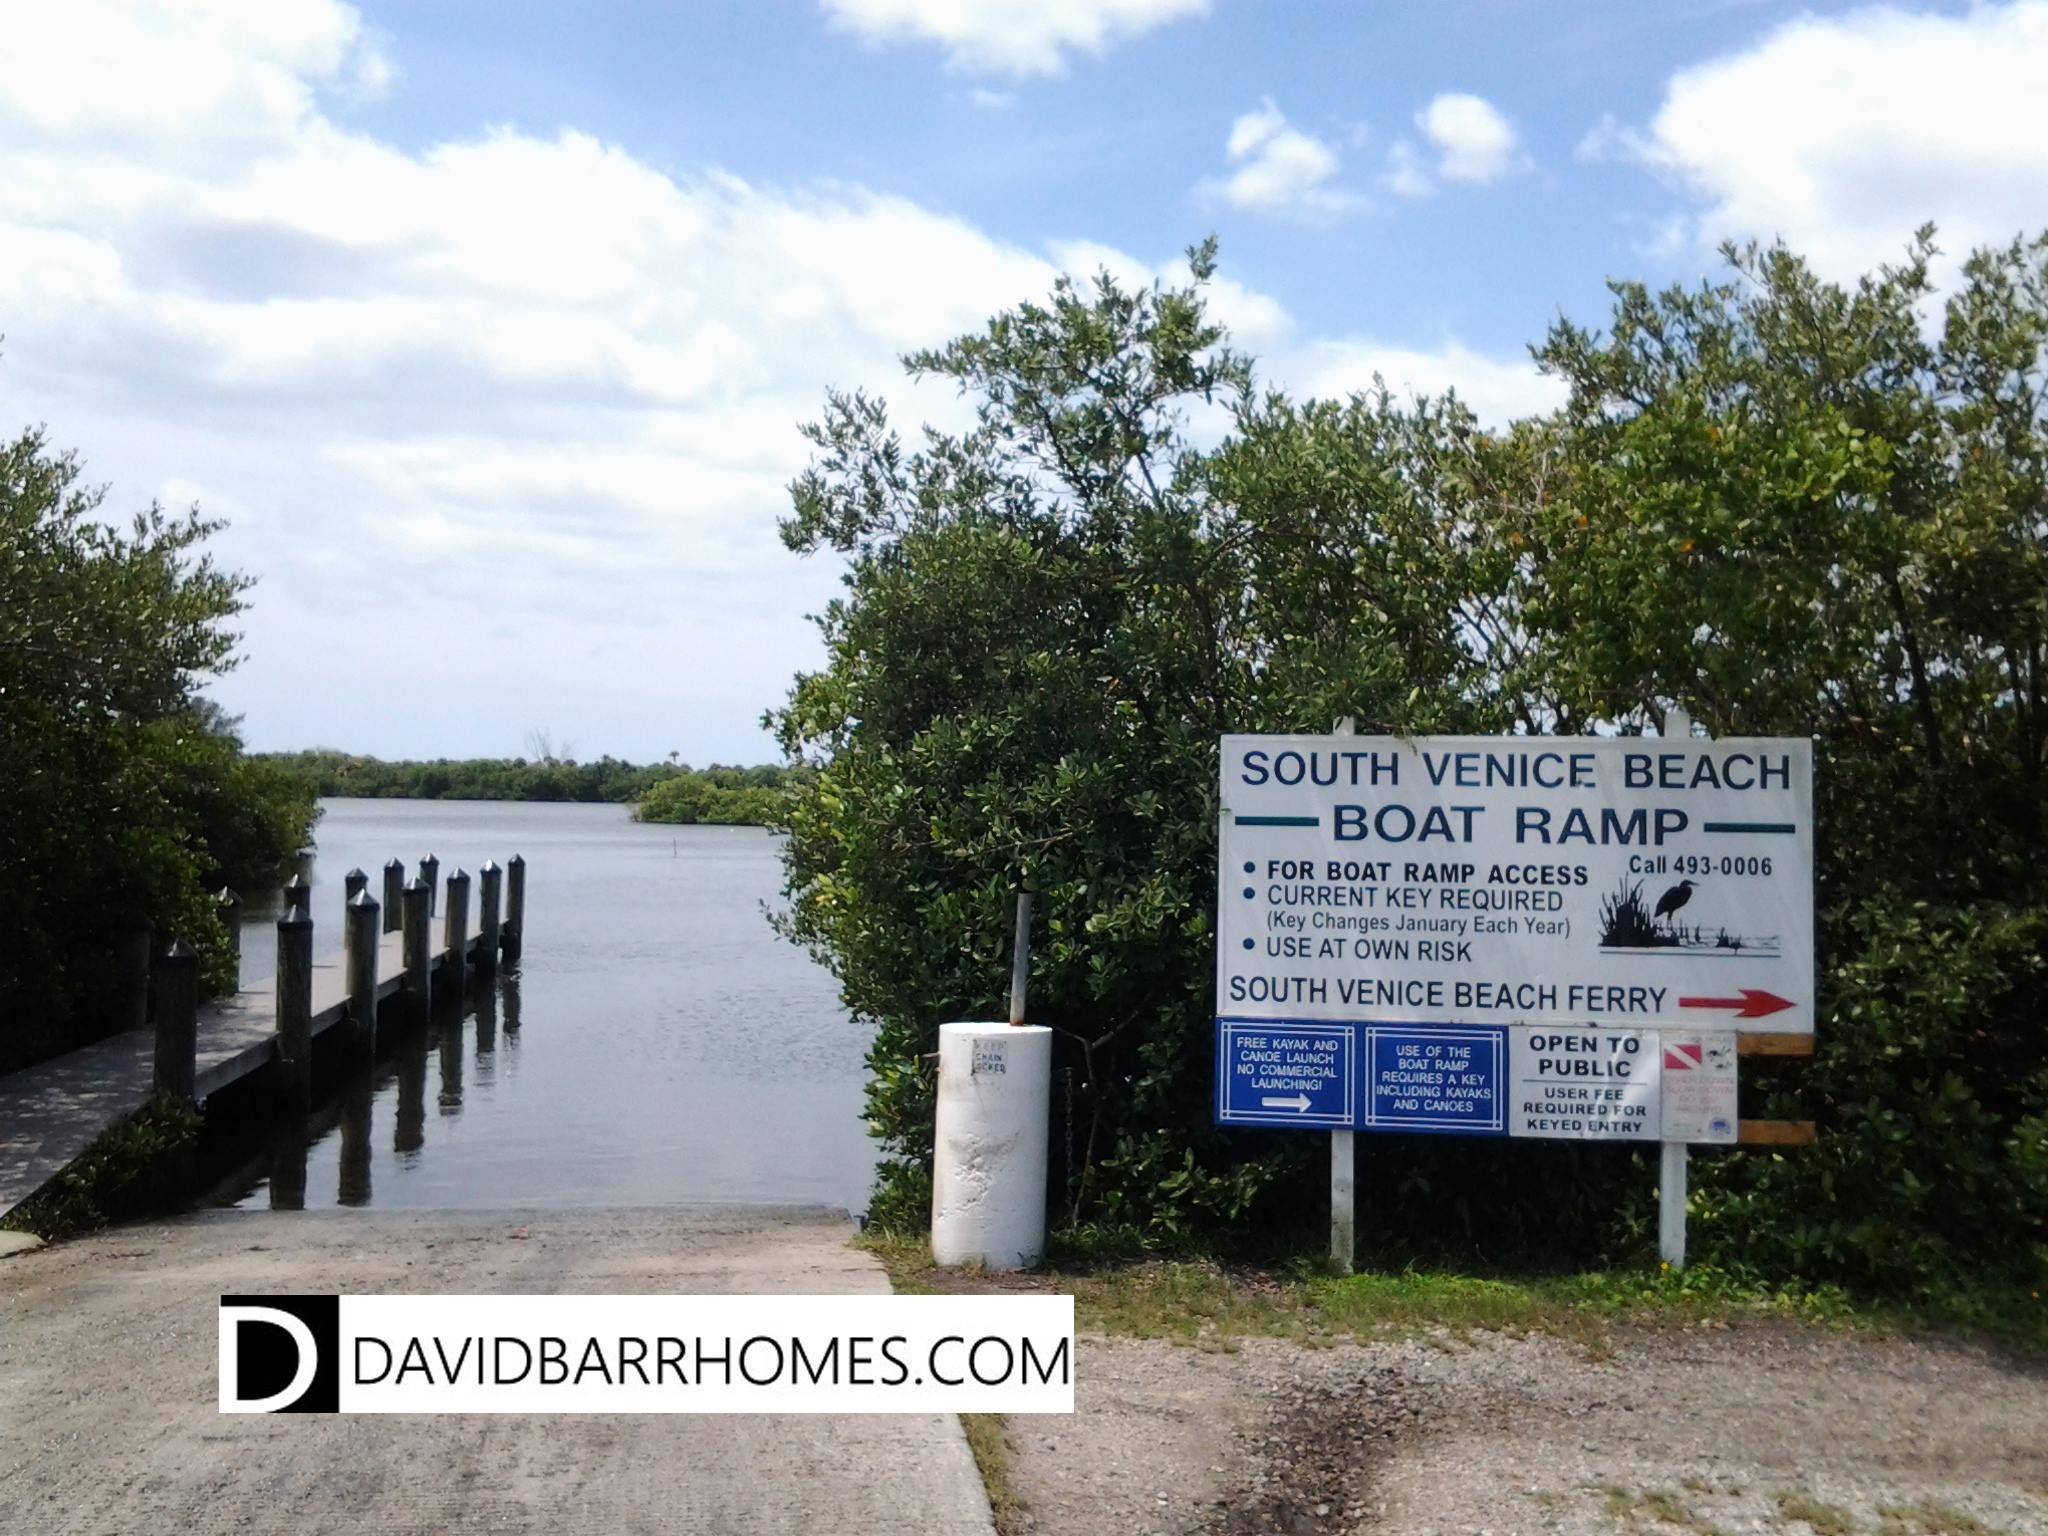 South Venice boat ramp